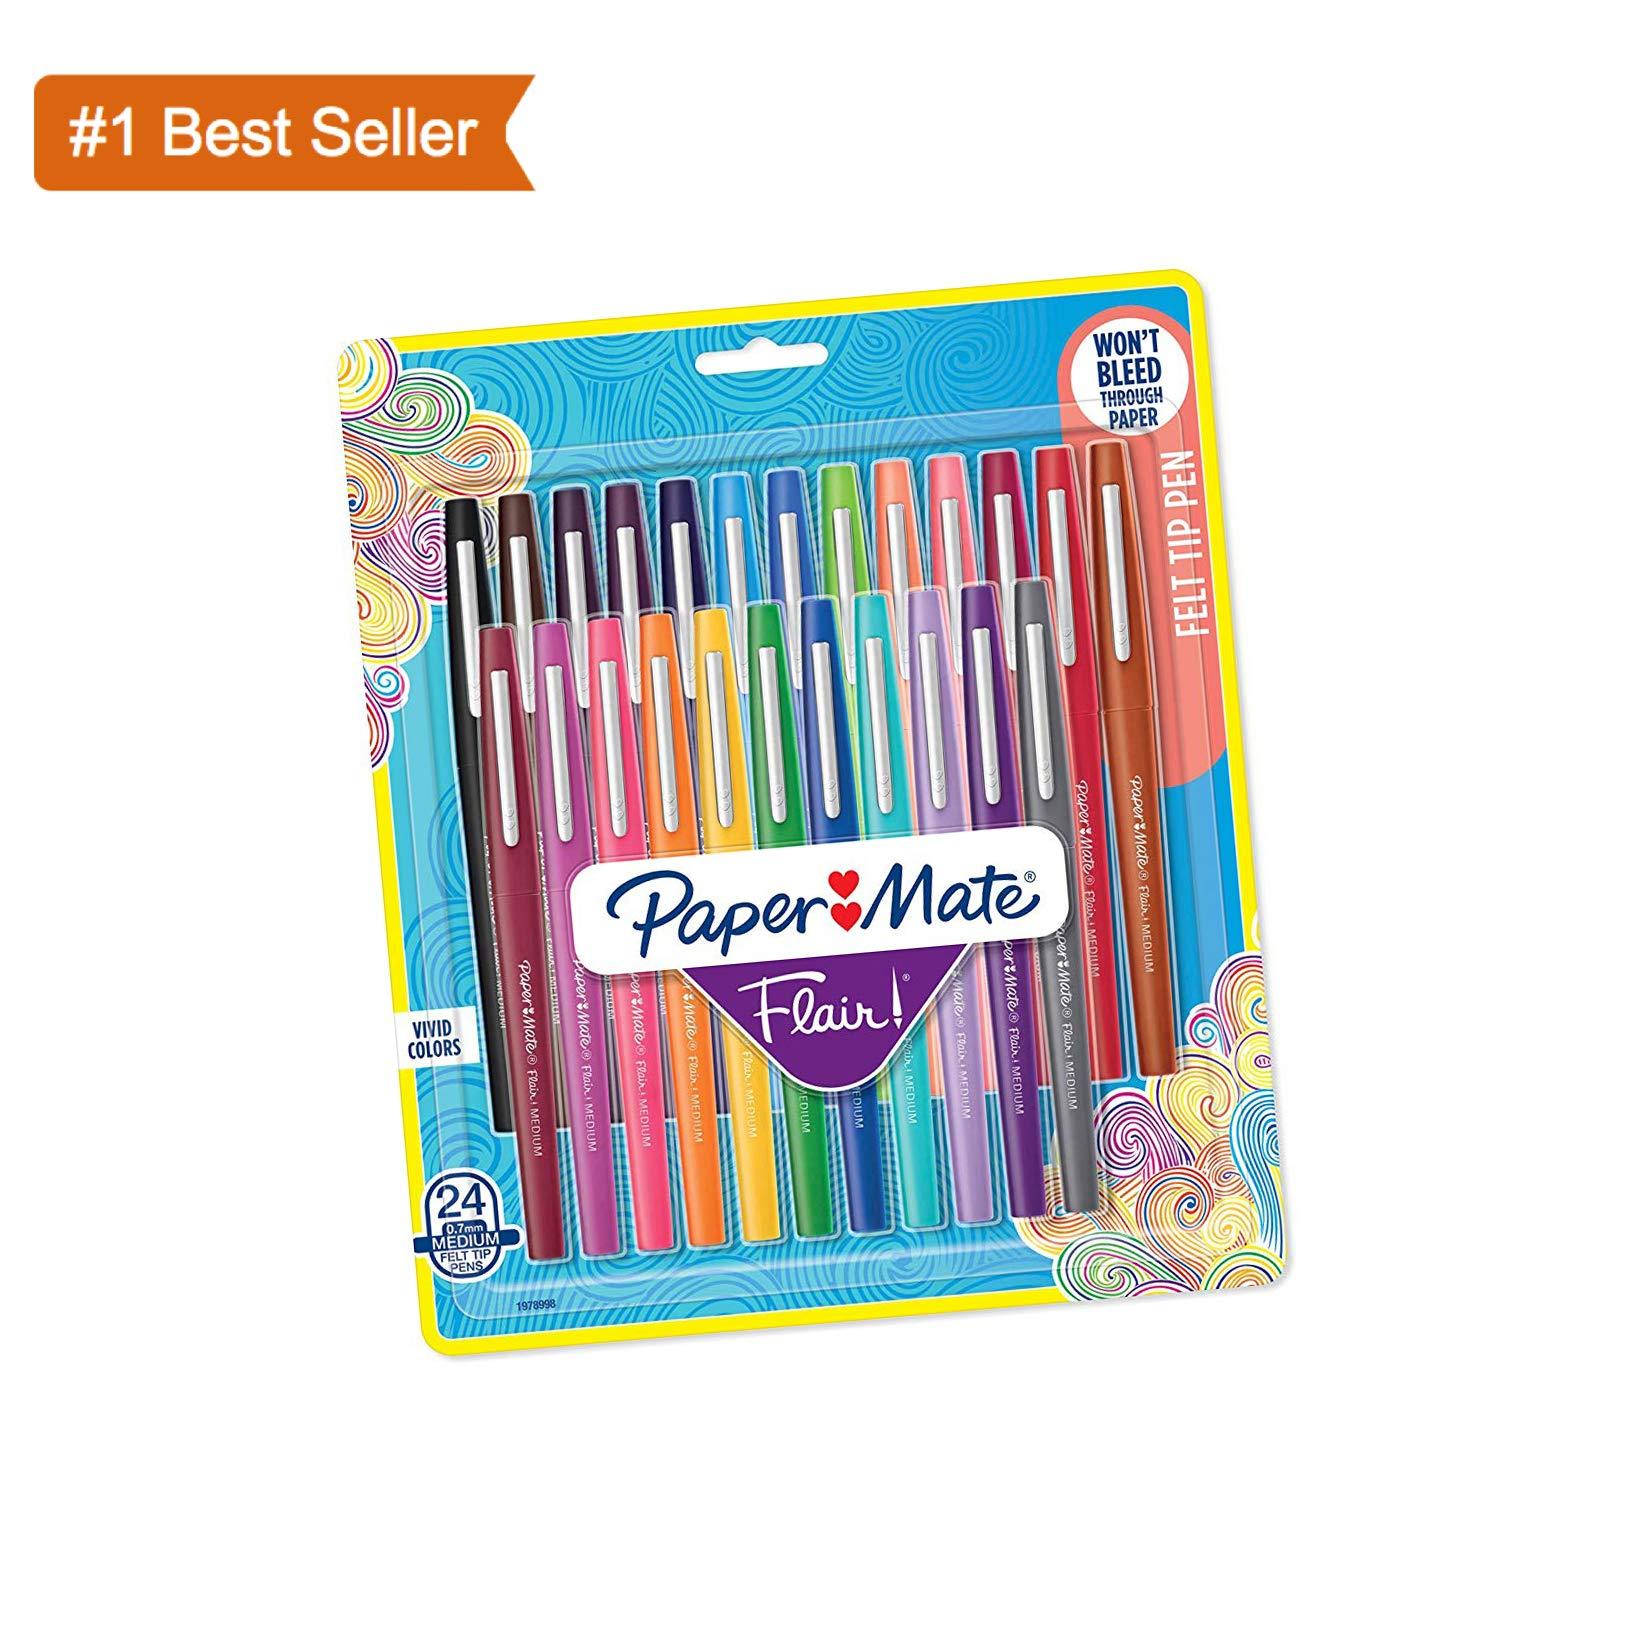 Paper Mate Flair Felt Tip Pens, Medium Point (0.7mm), Assorted, 24 Count